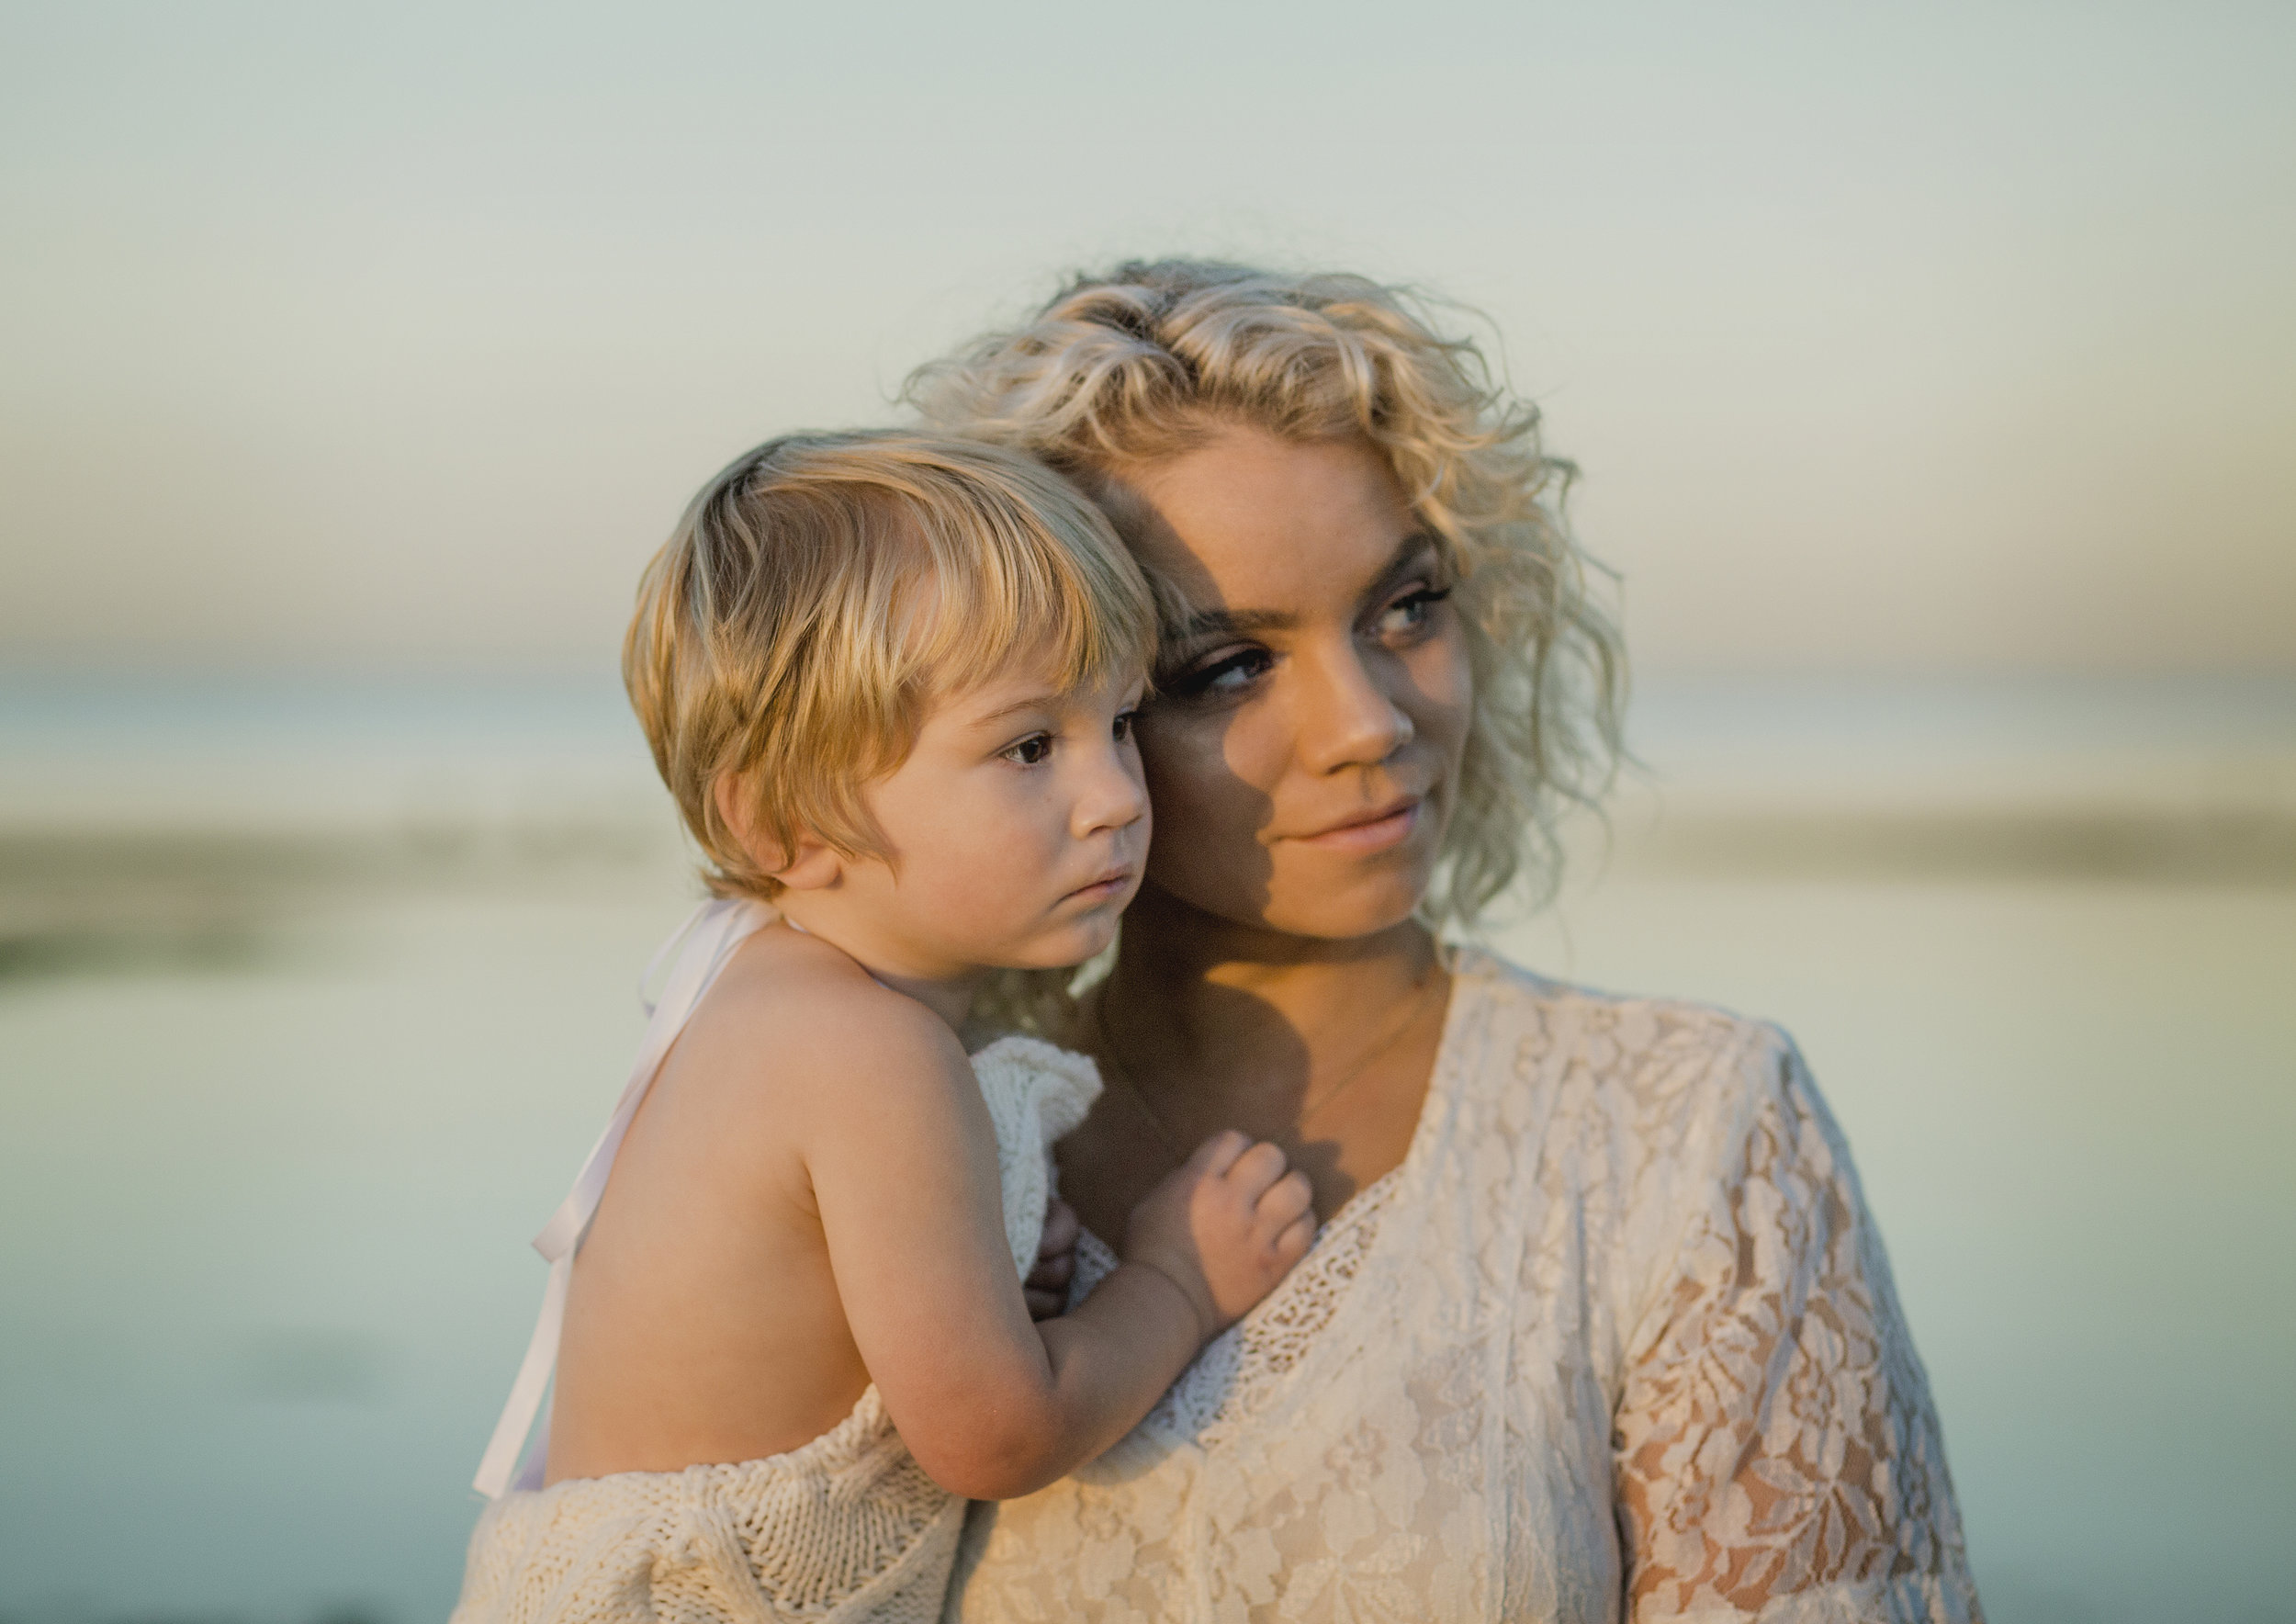 Family Sunrise photo shoot at the beach